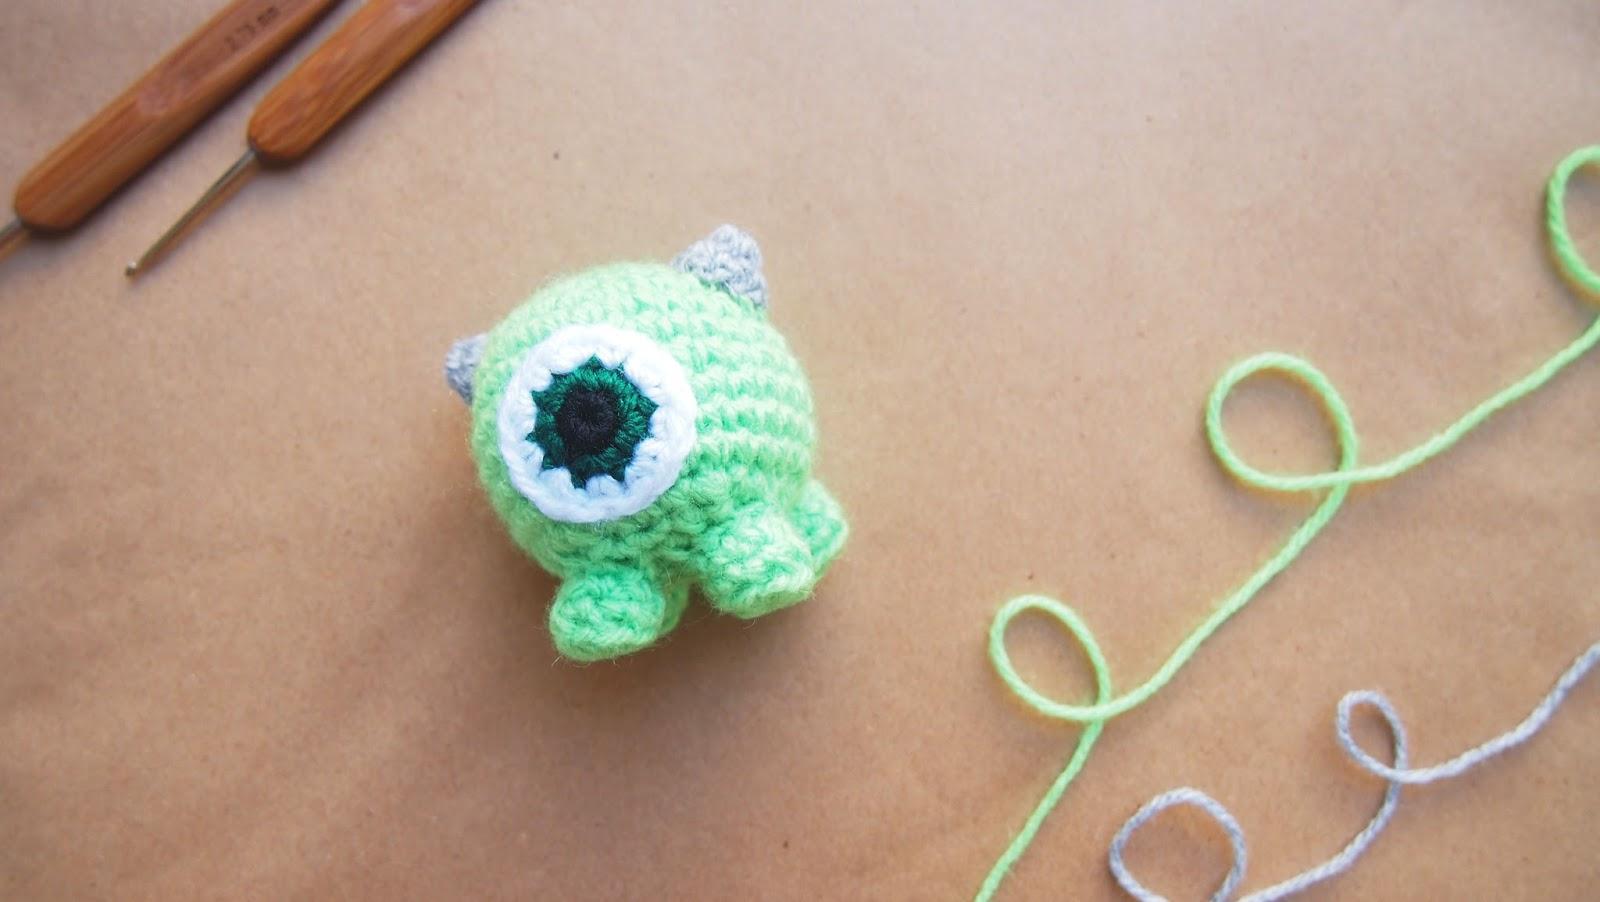 sol de noche deco crochet mike wazowski crochet tsum. Black Bedroom Furniture Sets. Home Design Ideas